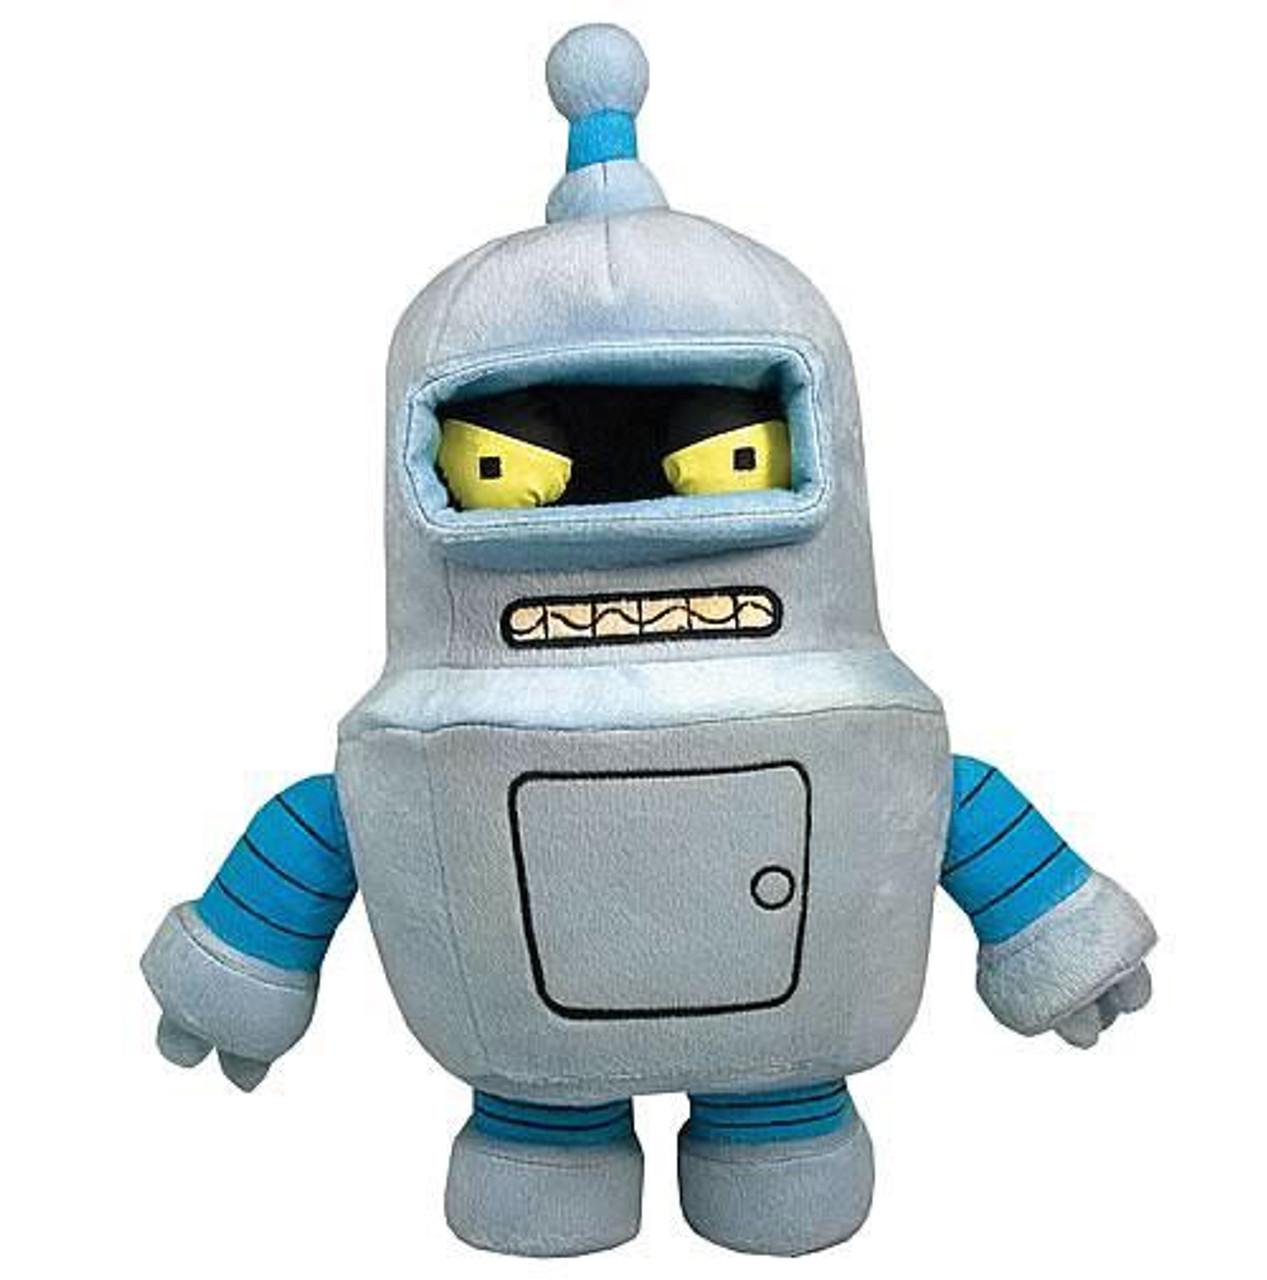 Futurama Deluxe Series 1 Bender 10-Inch Plush Figure